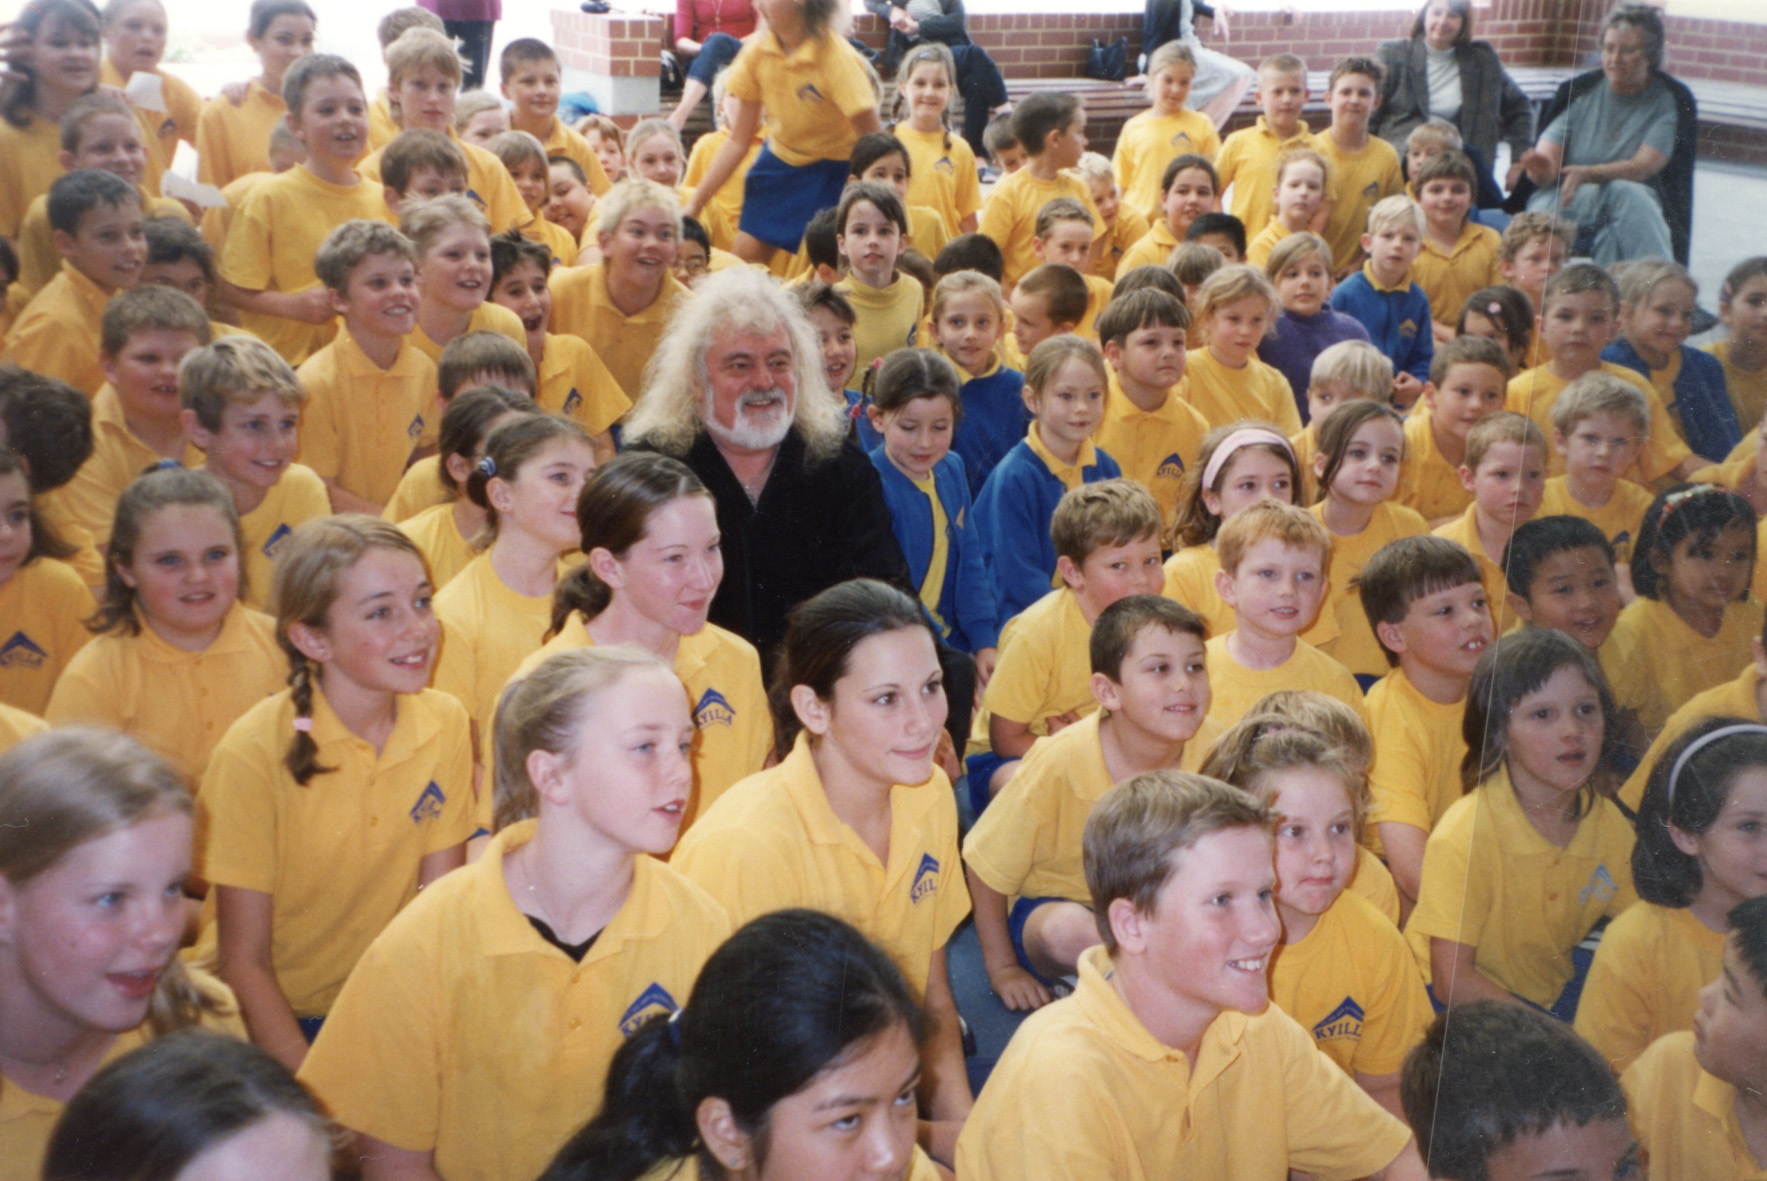 98. Brian Cadd visits Kyilla, 2001